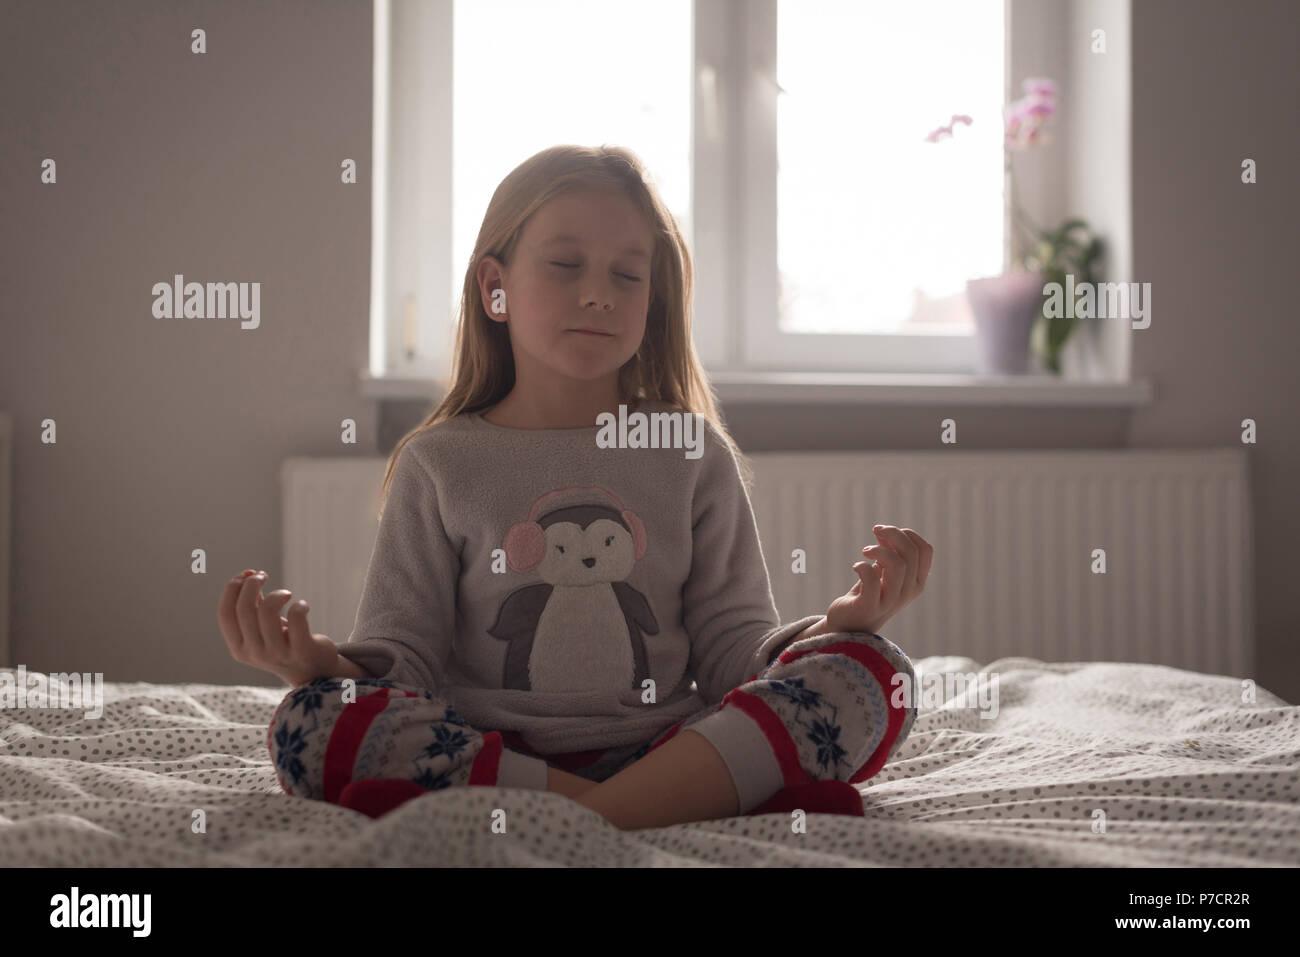 Girl performing yoga in bedroom - Stock Image